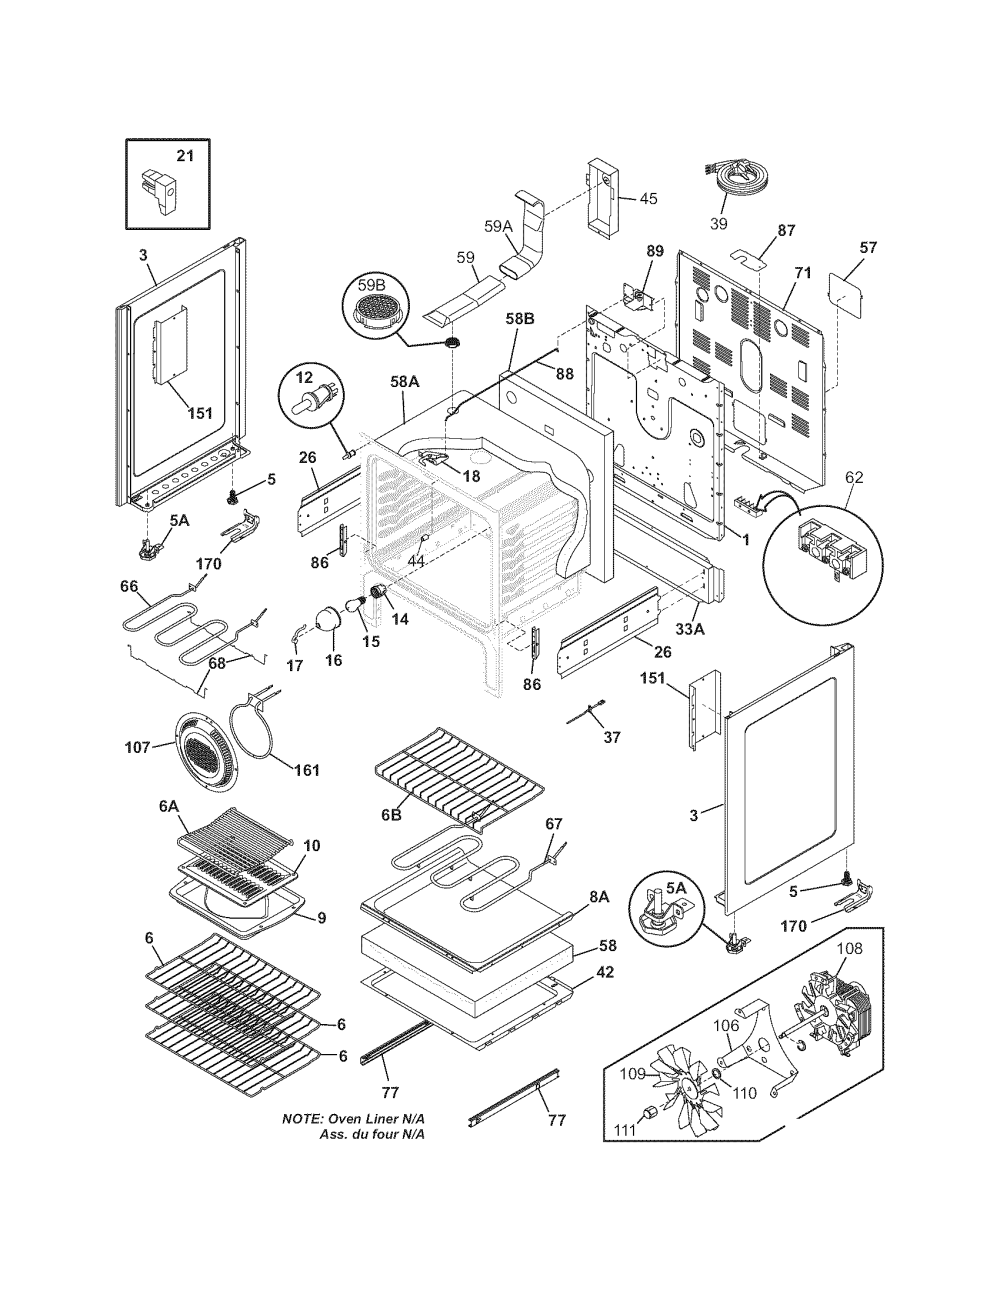 medium resolution of frigidaire gallary series dryer wiring diagram 46 wiring frigidaire washer dryer combo schematic frigidaire gallery washer dryer combo